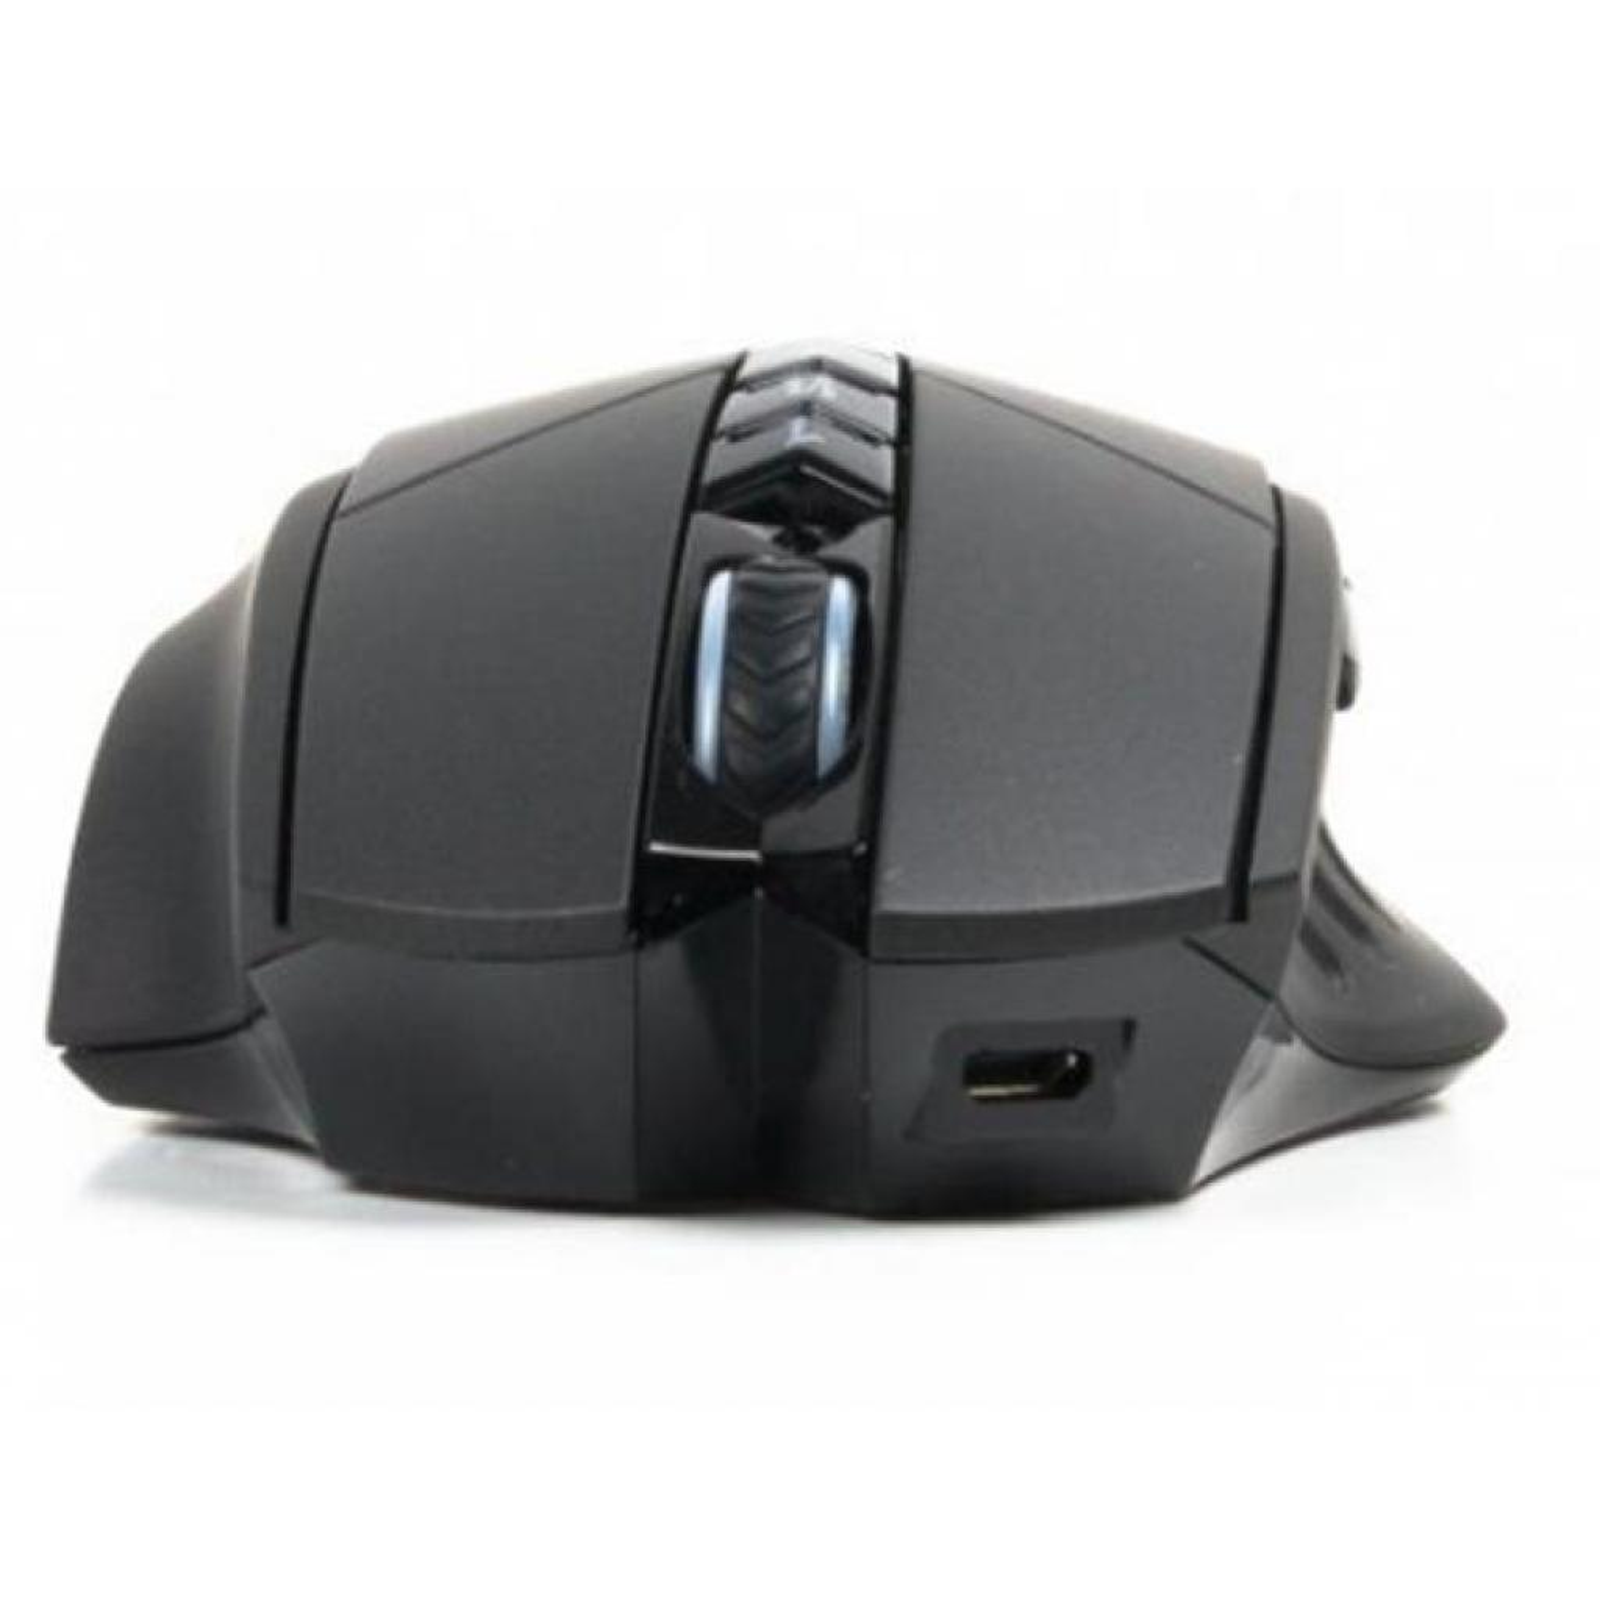 Мышка A4tech Bloody R70A Black изображение 7